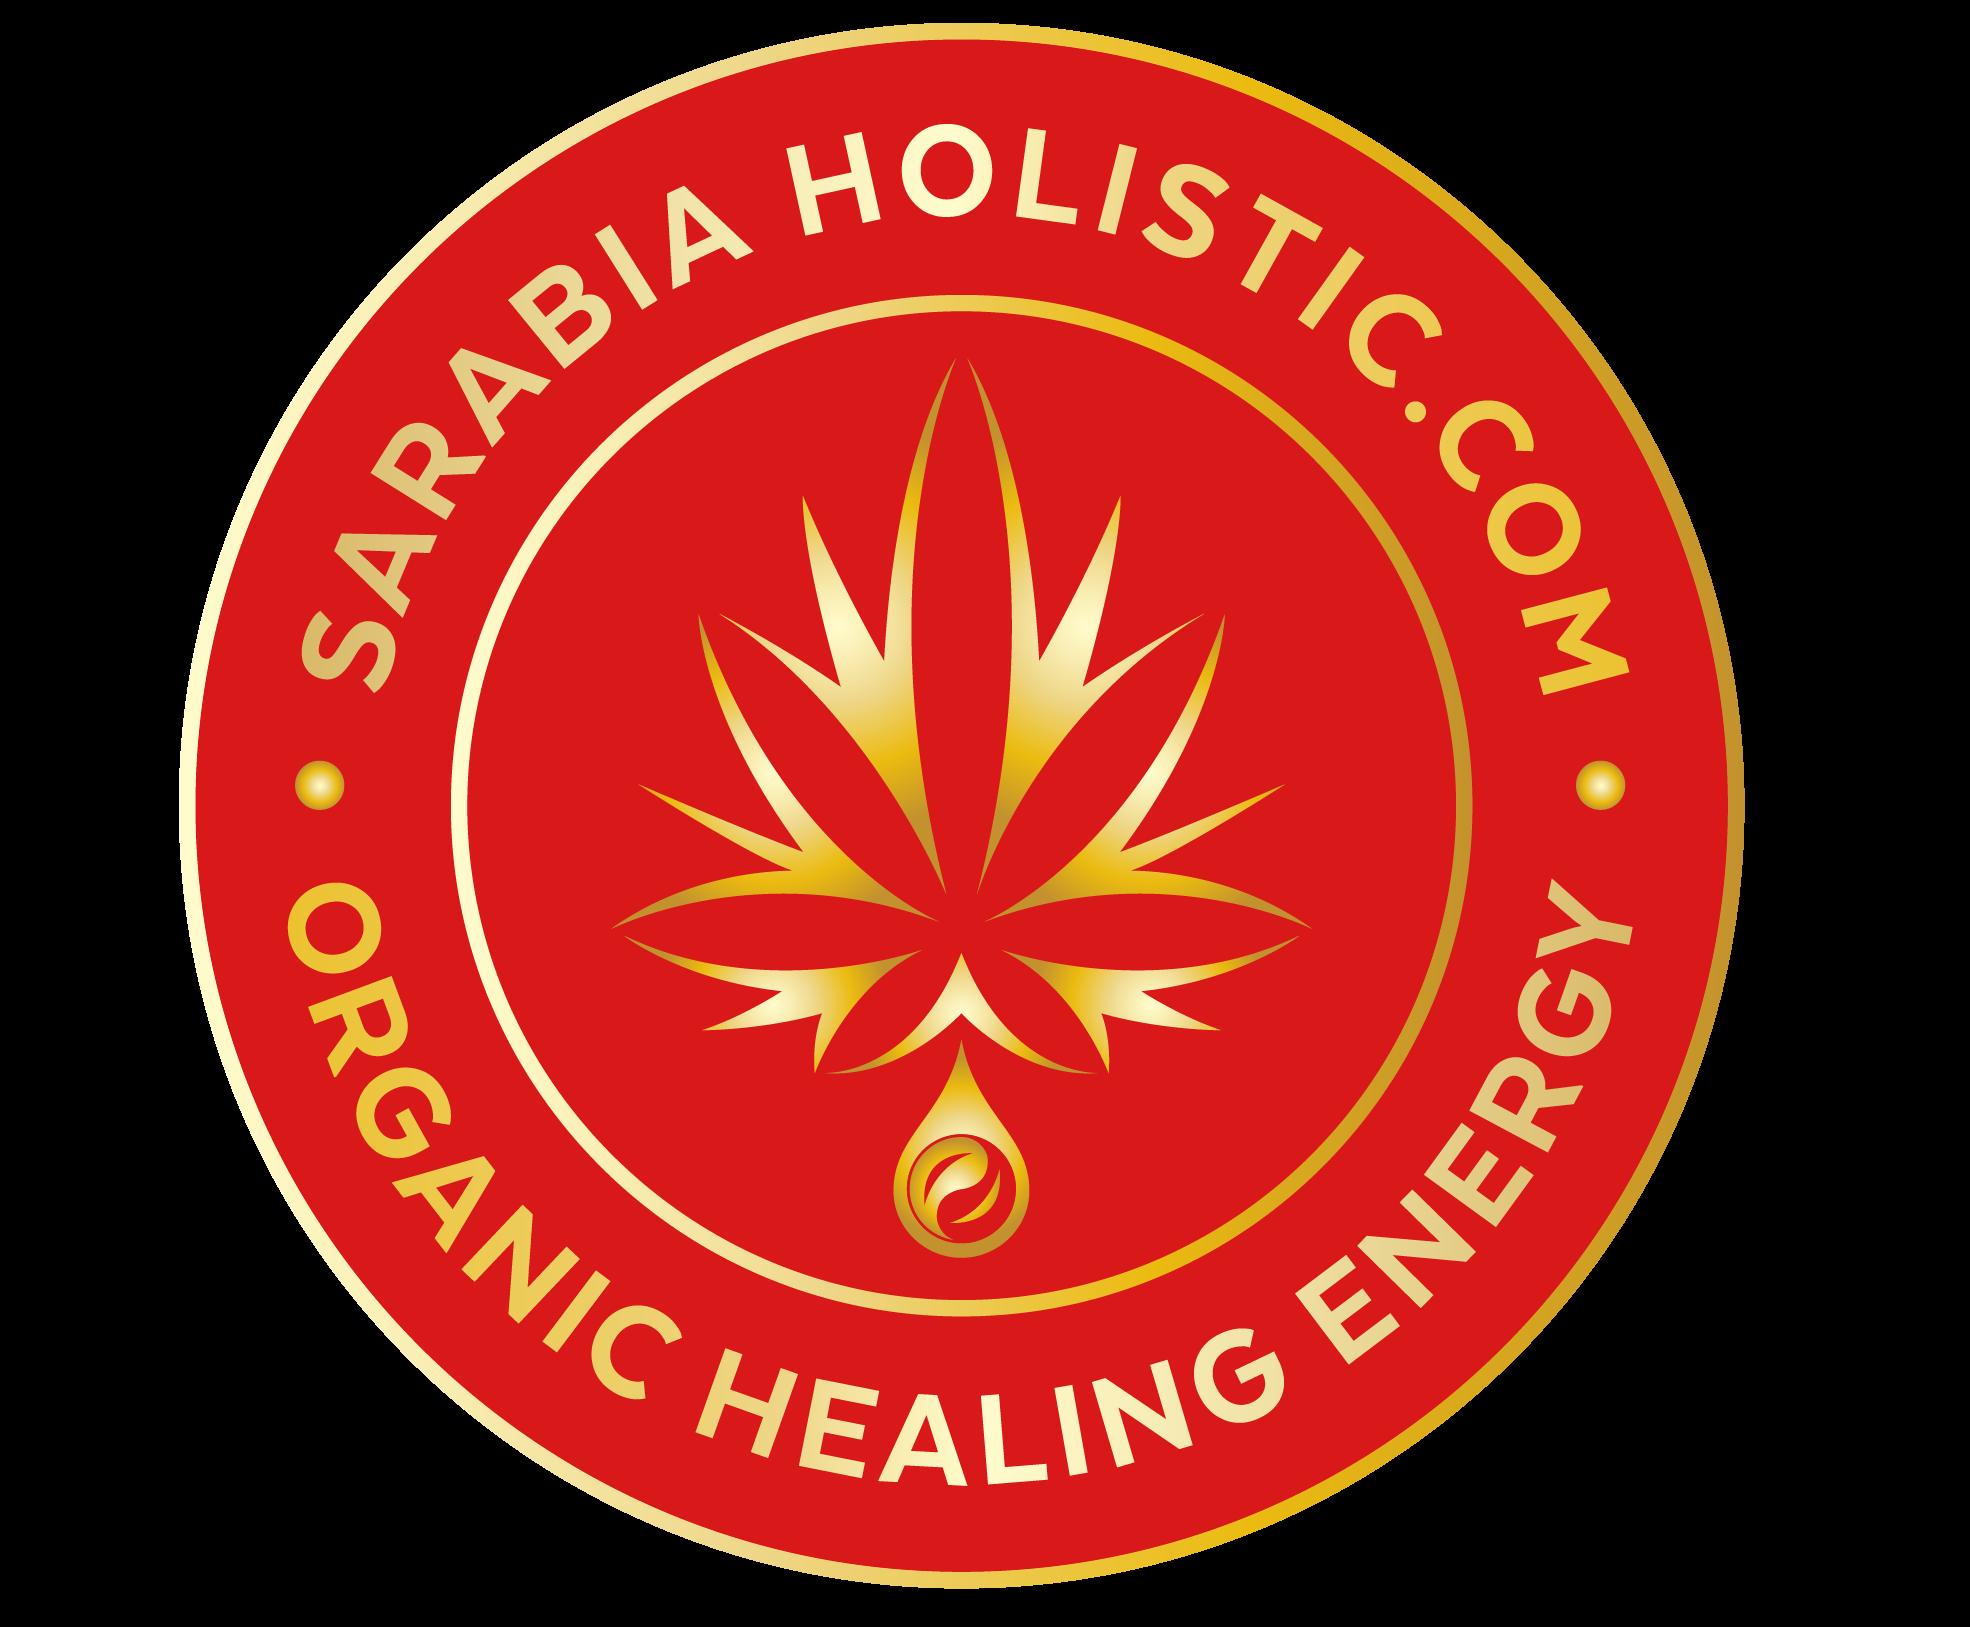 Sarabia Holistic